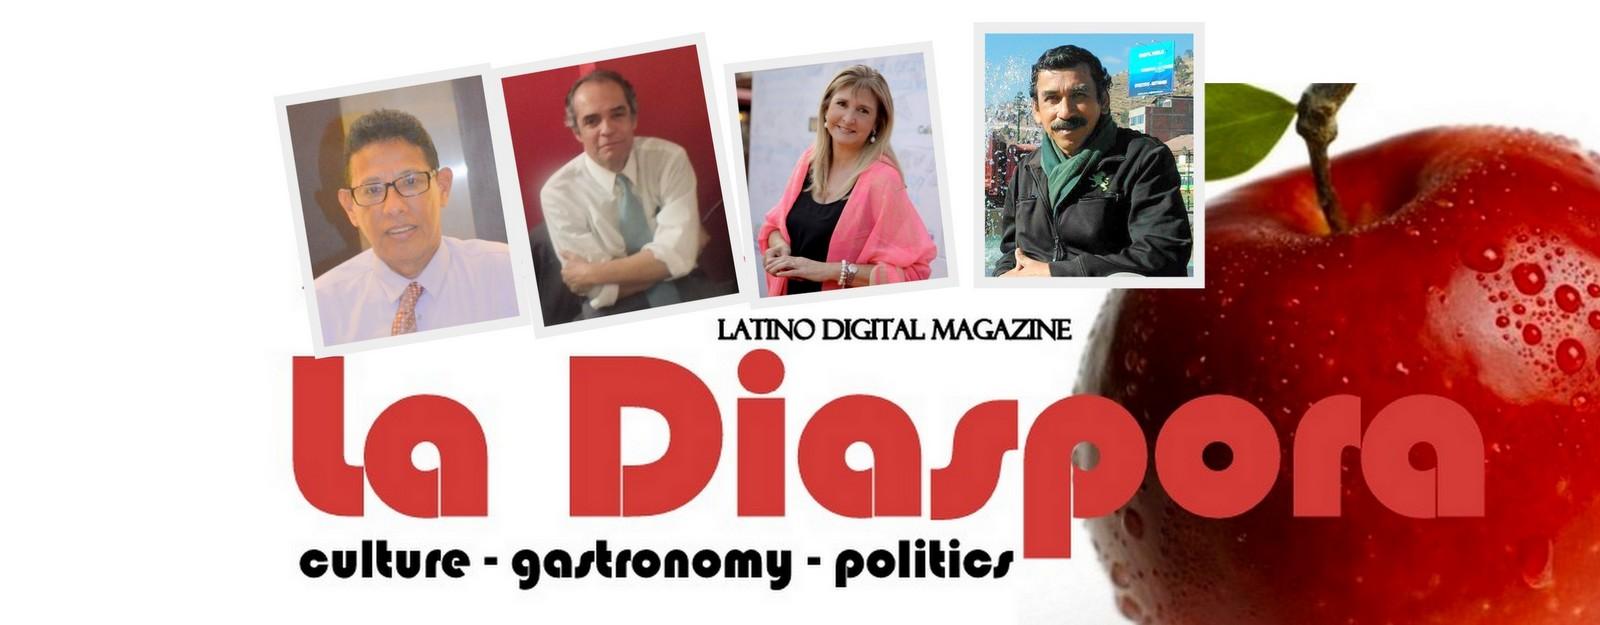 La Diaspora - Latino Digital Magazine: Actualidad-Analisis e Informacion Digital